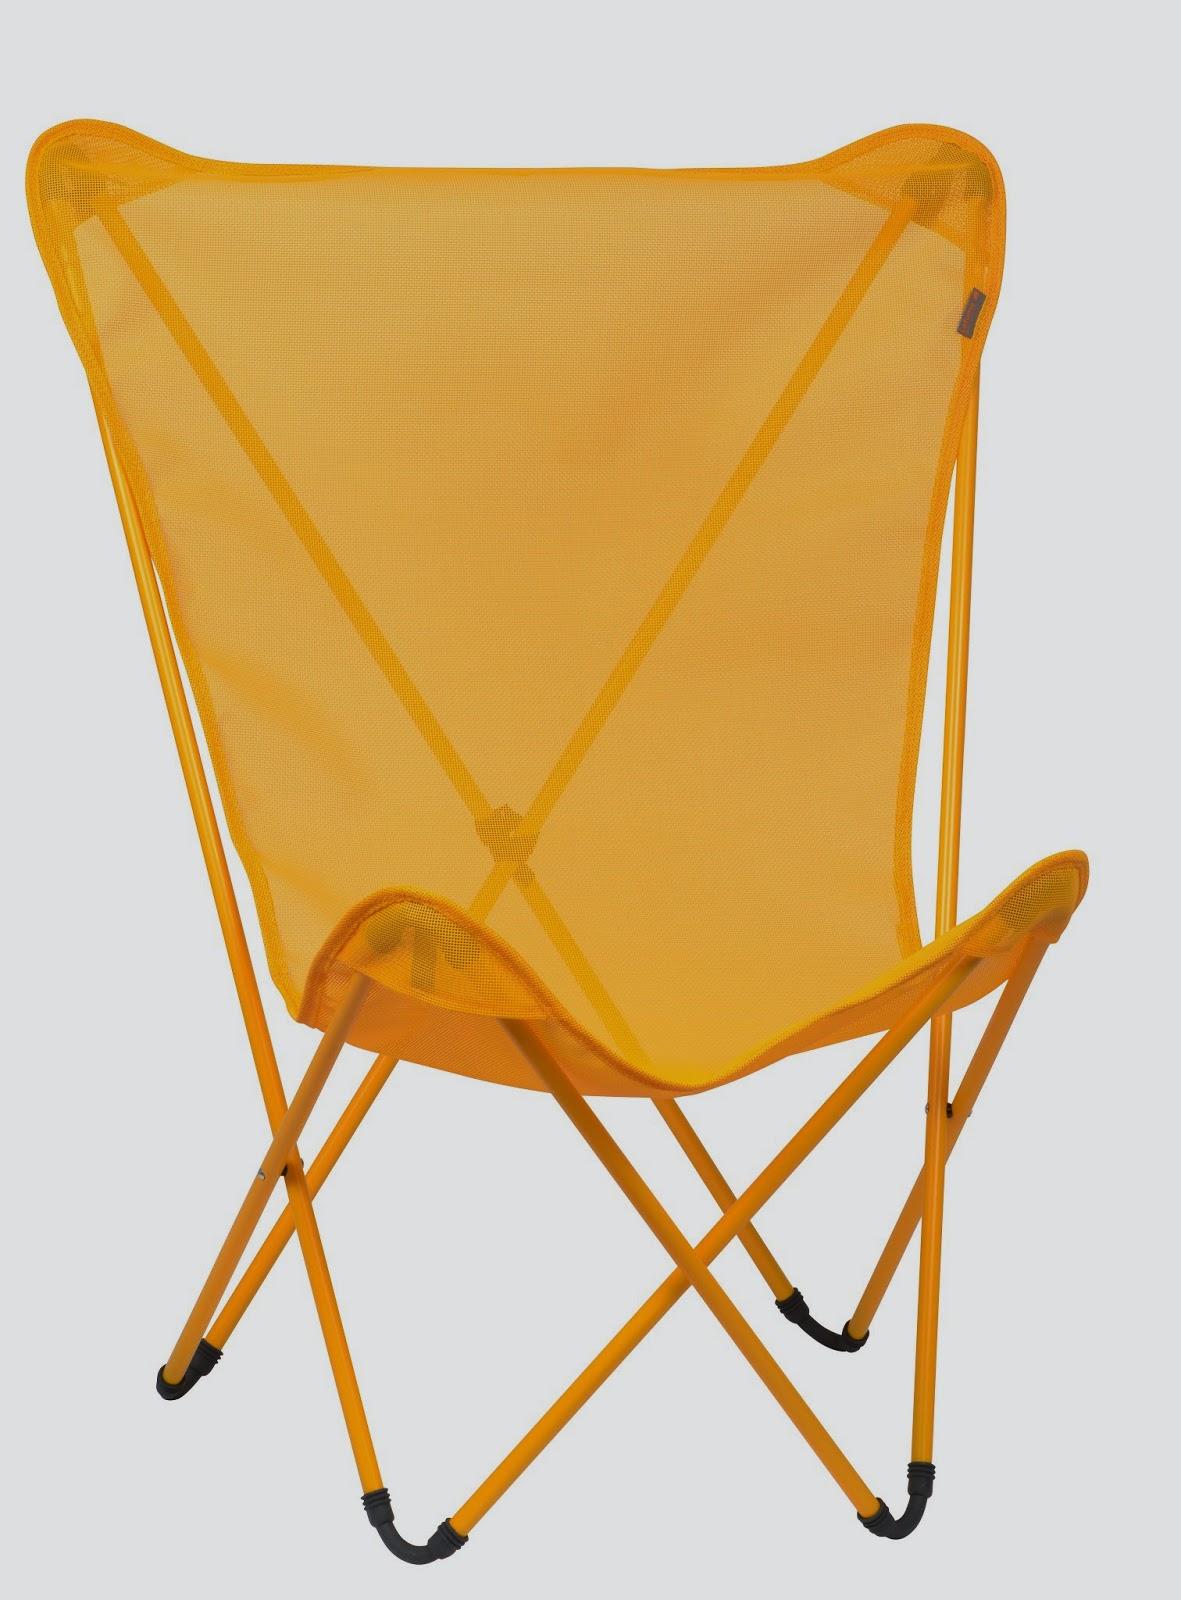 lafuma pop up chair zero gravity rocking reviews tuindesign mei 2015